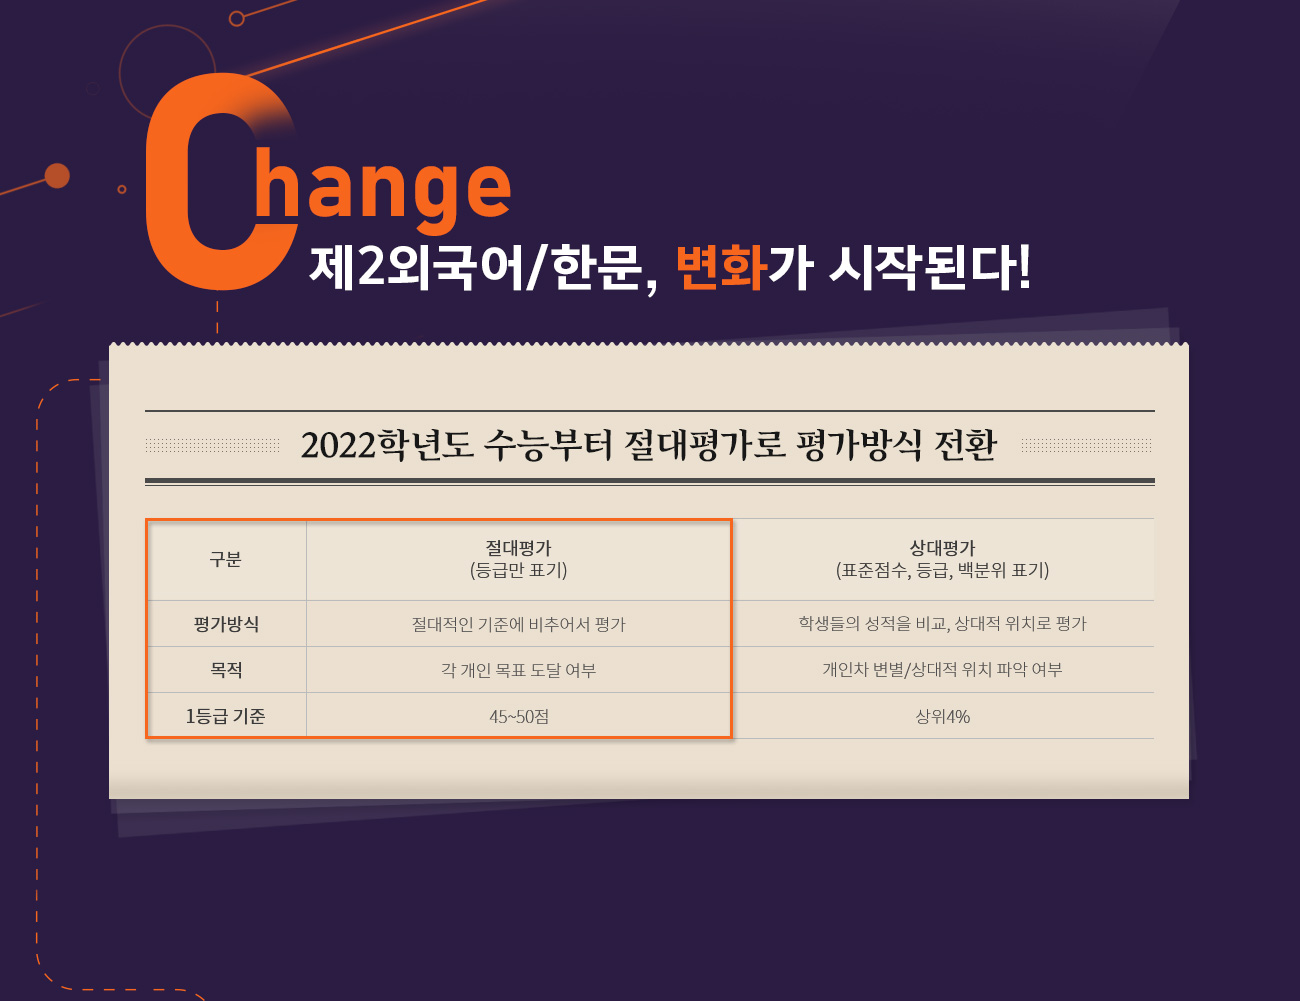 Change 제2외국어/한문, 변화가 시작된다!